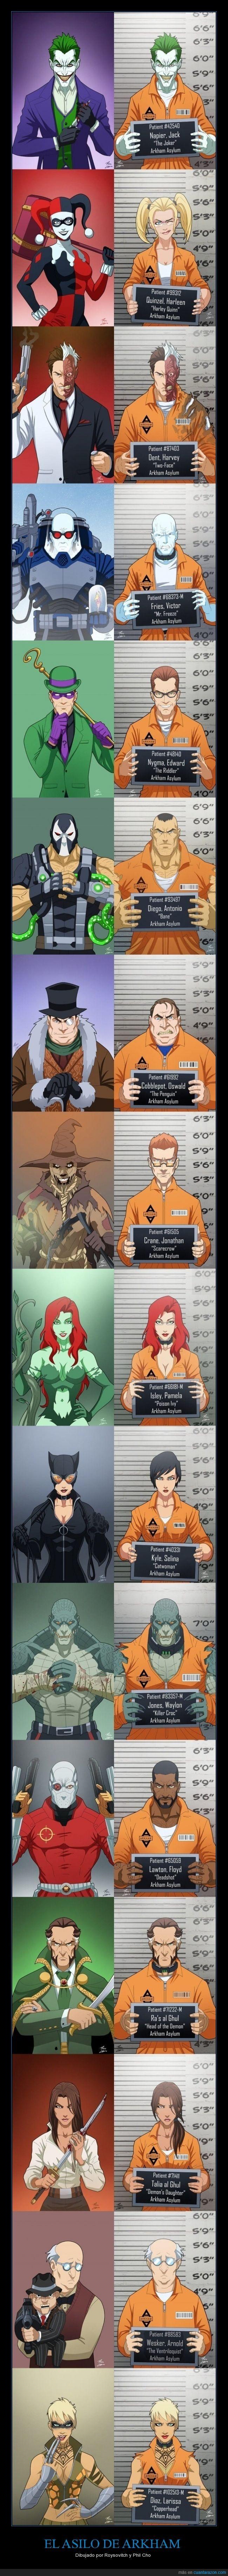 1002839 - Los pacientes de Gotham  reunidos